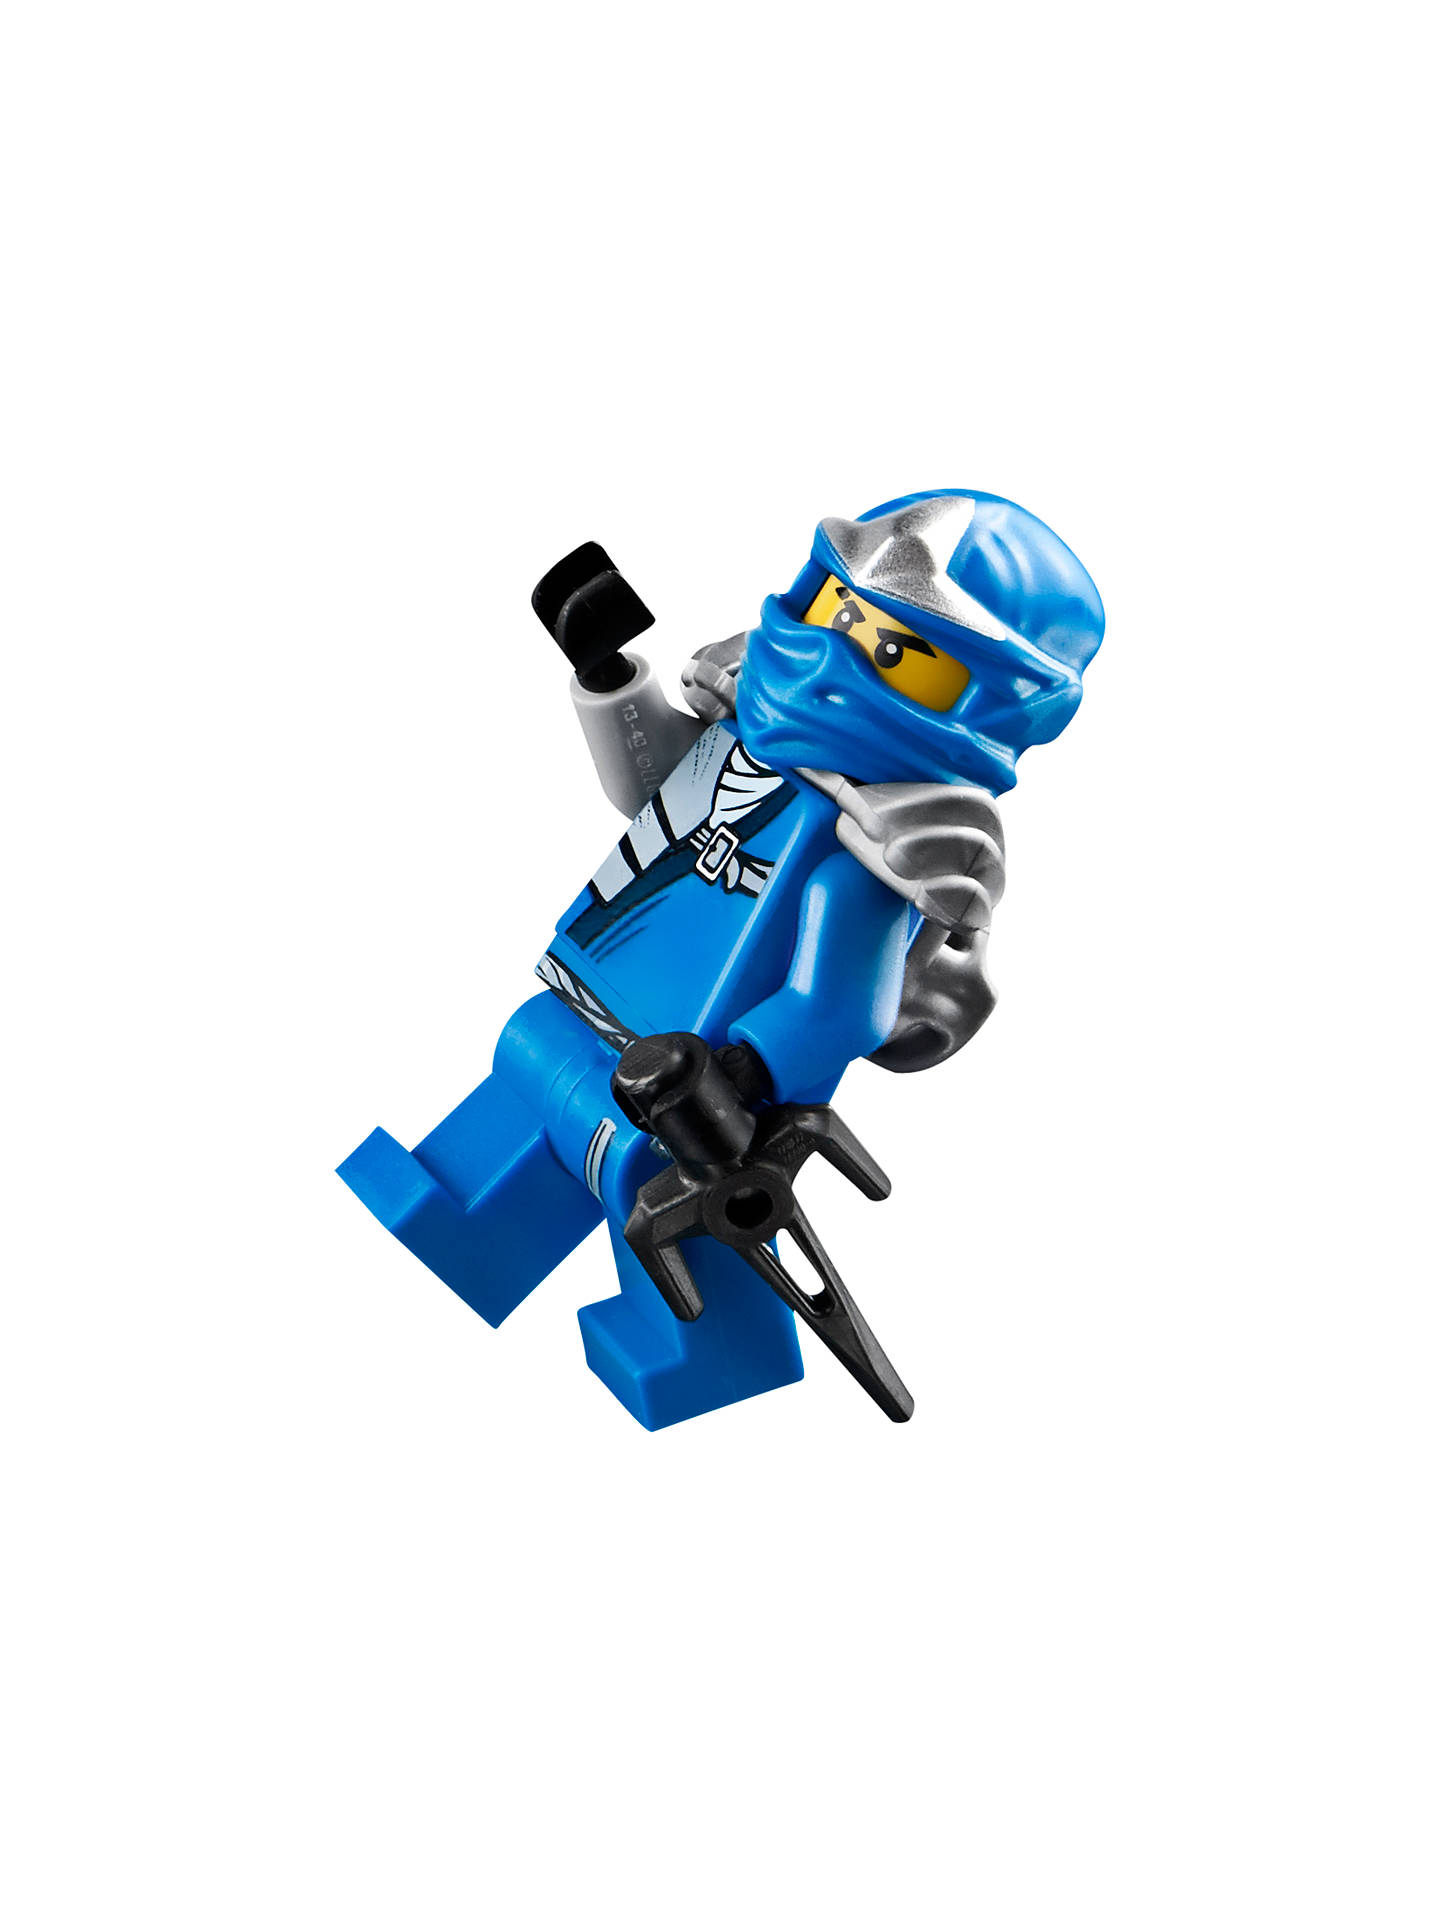 LEGO Ninjago Epic Dragon Battle Set at John Lewis & Partners